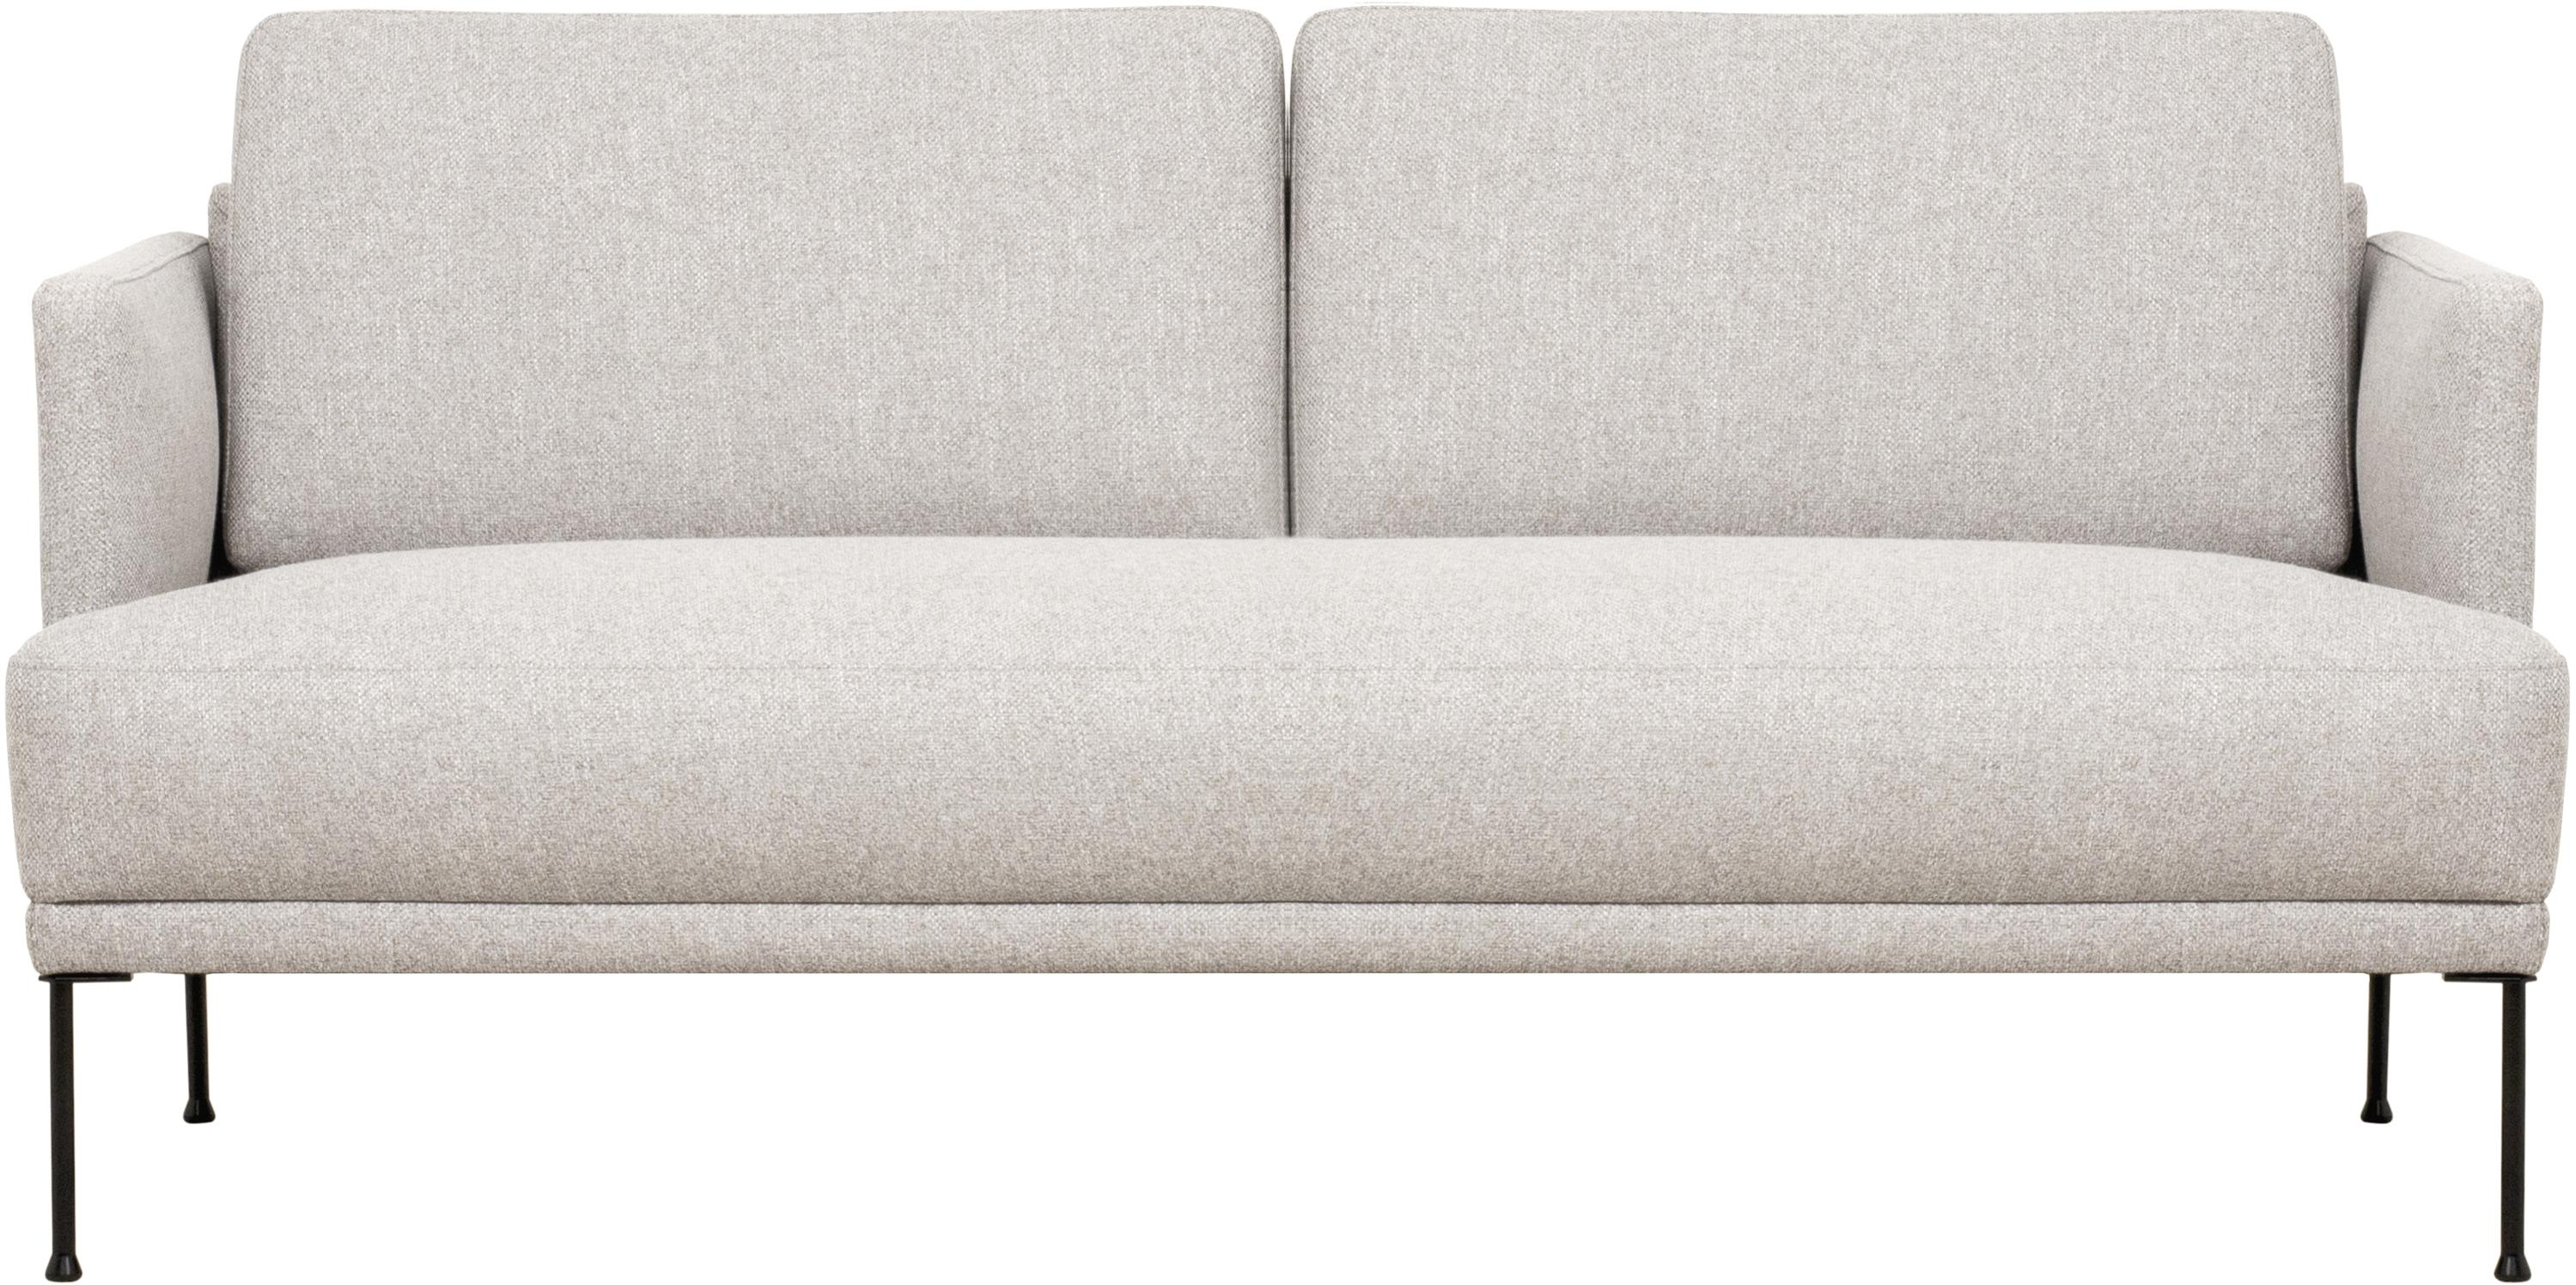 Sofa Fluente (2-Sitzer), Bezug: 80% Polyester, 20% Ramie , Gestell: Massives Kiefernholz, Webstoff Beige, B 166 x T 85 cm